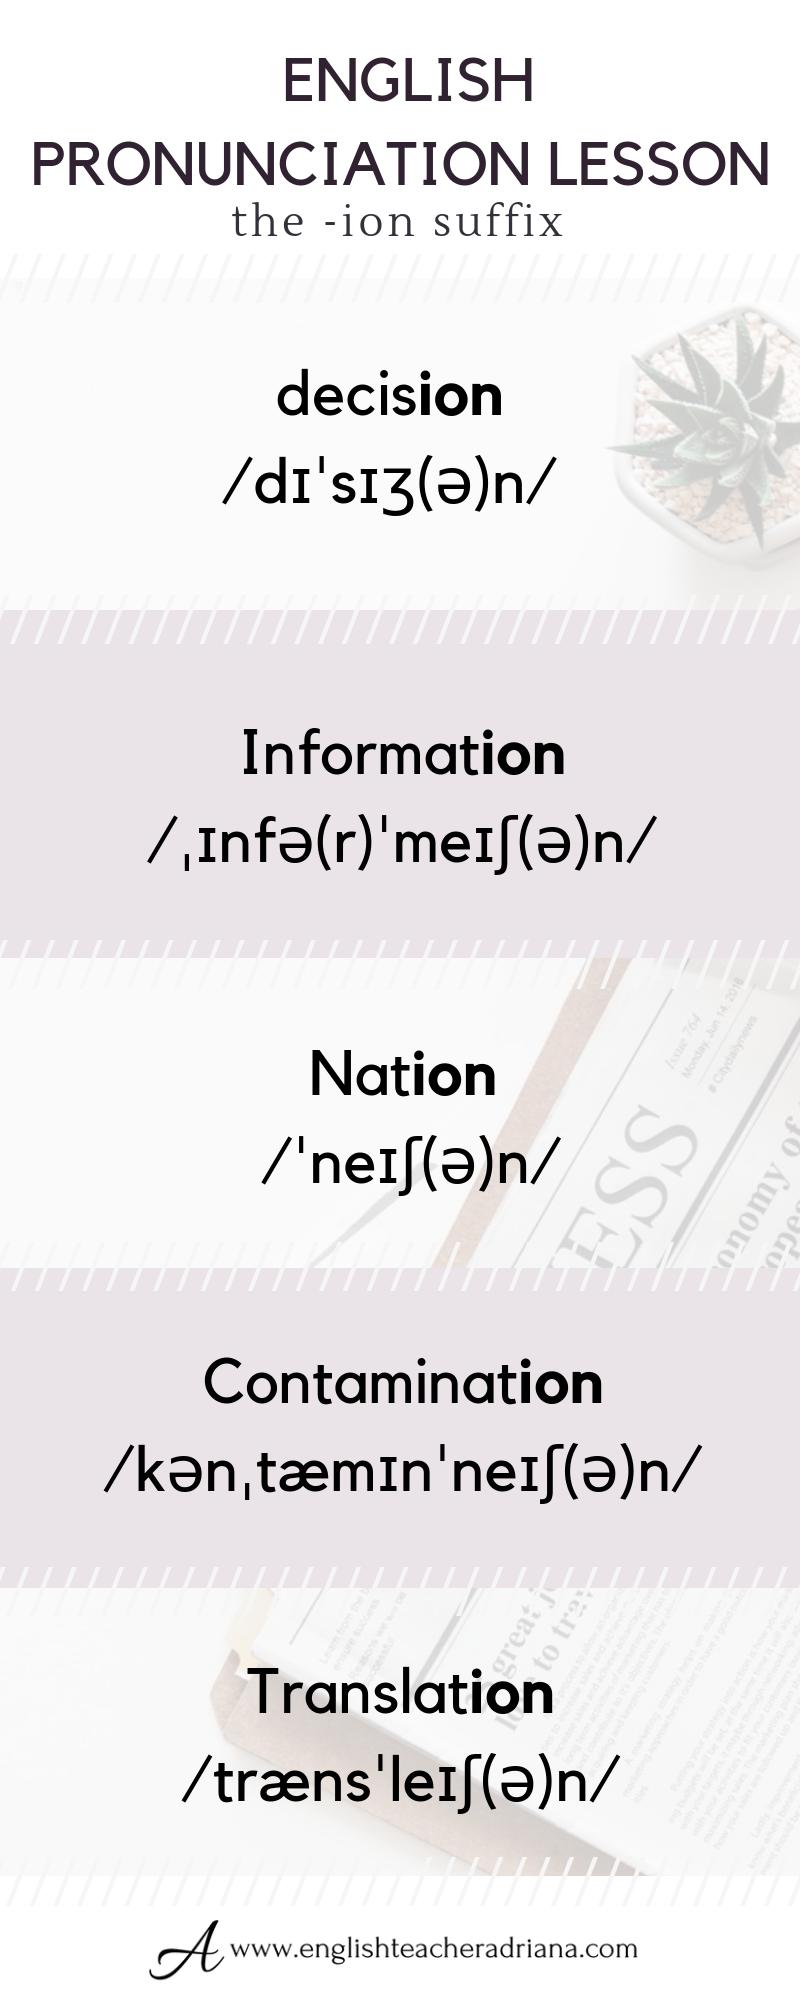 English Pronunciation Lessons